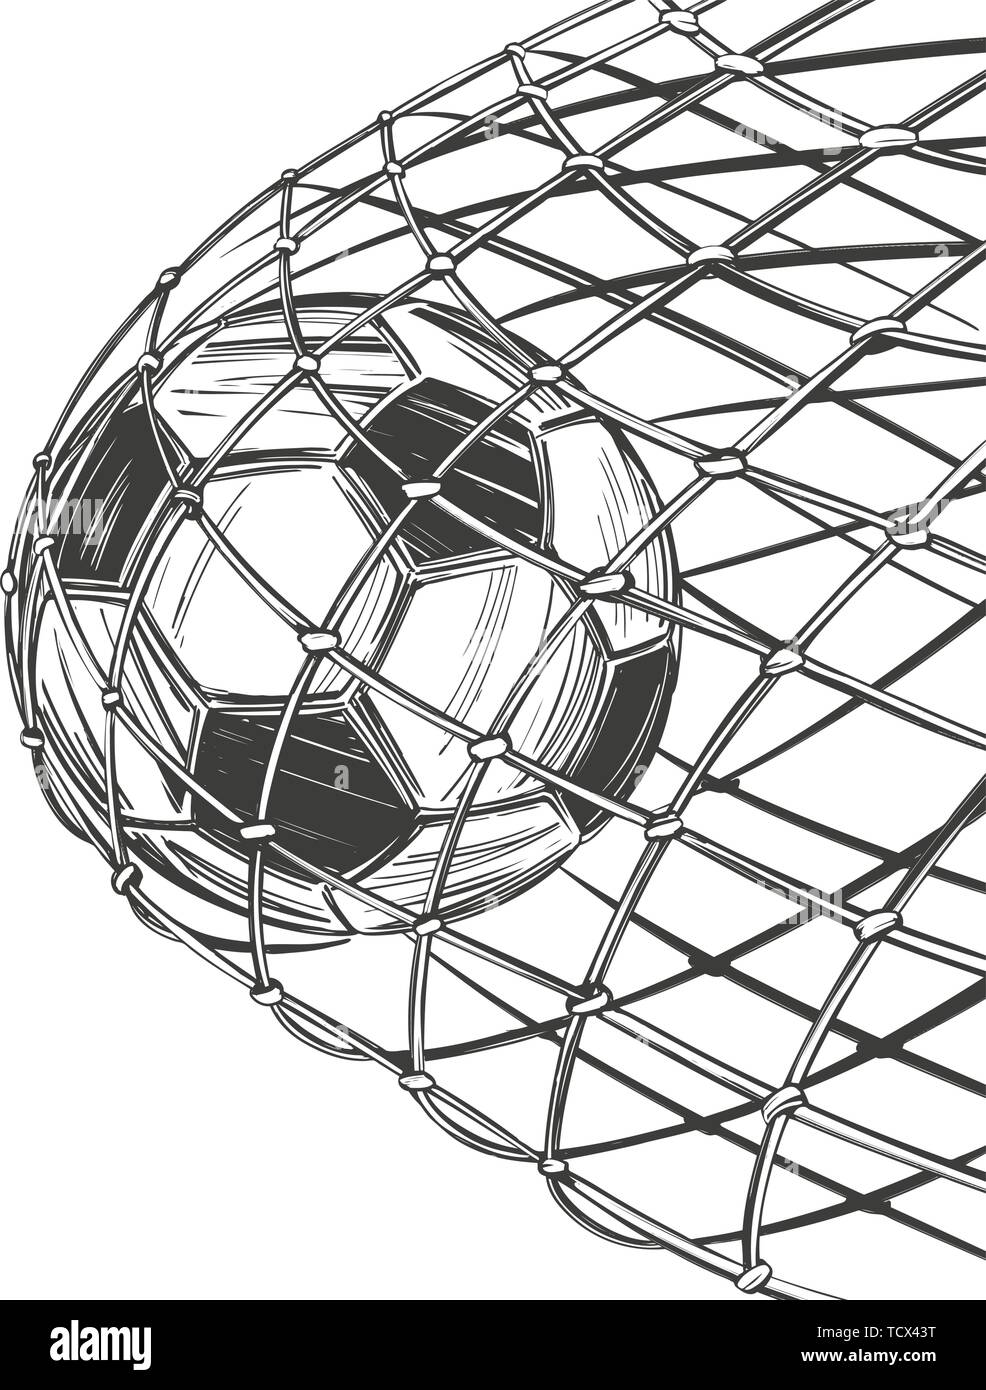 Fussball Fussball Ziel Kam Im Tor Win Sport Spiel Emblem